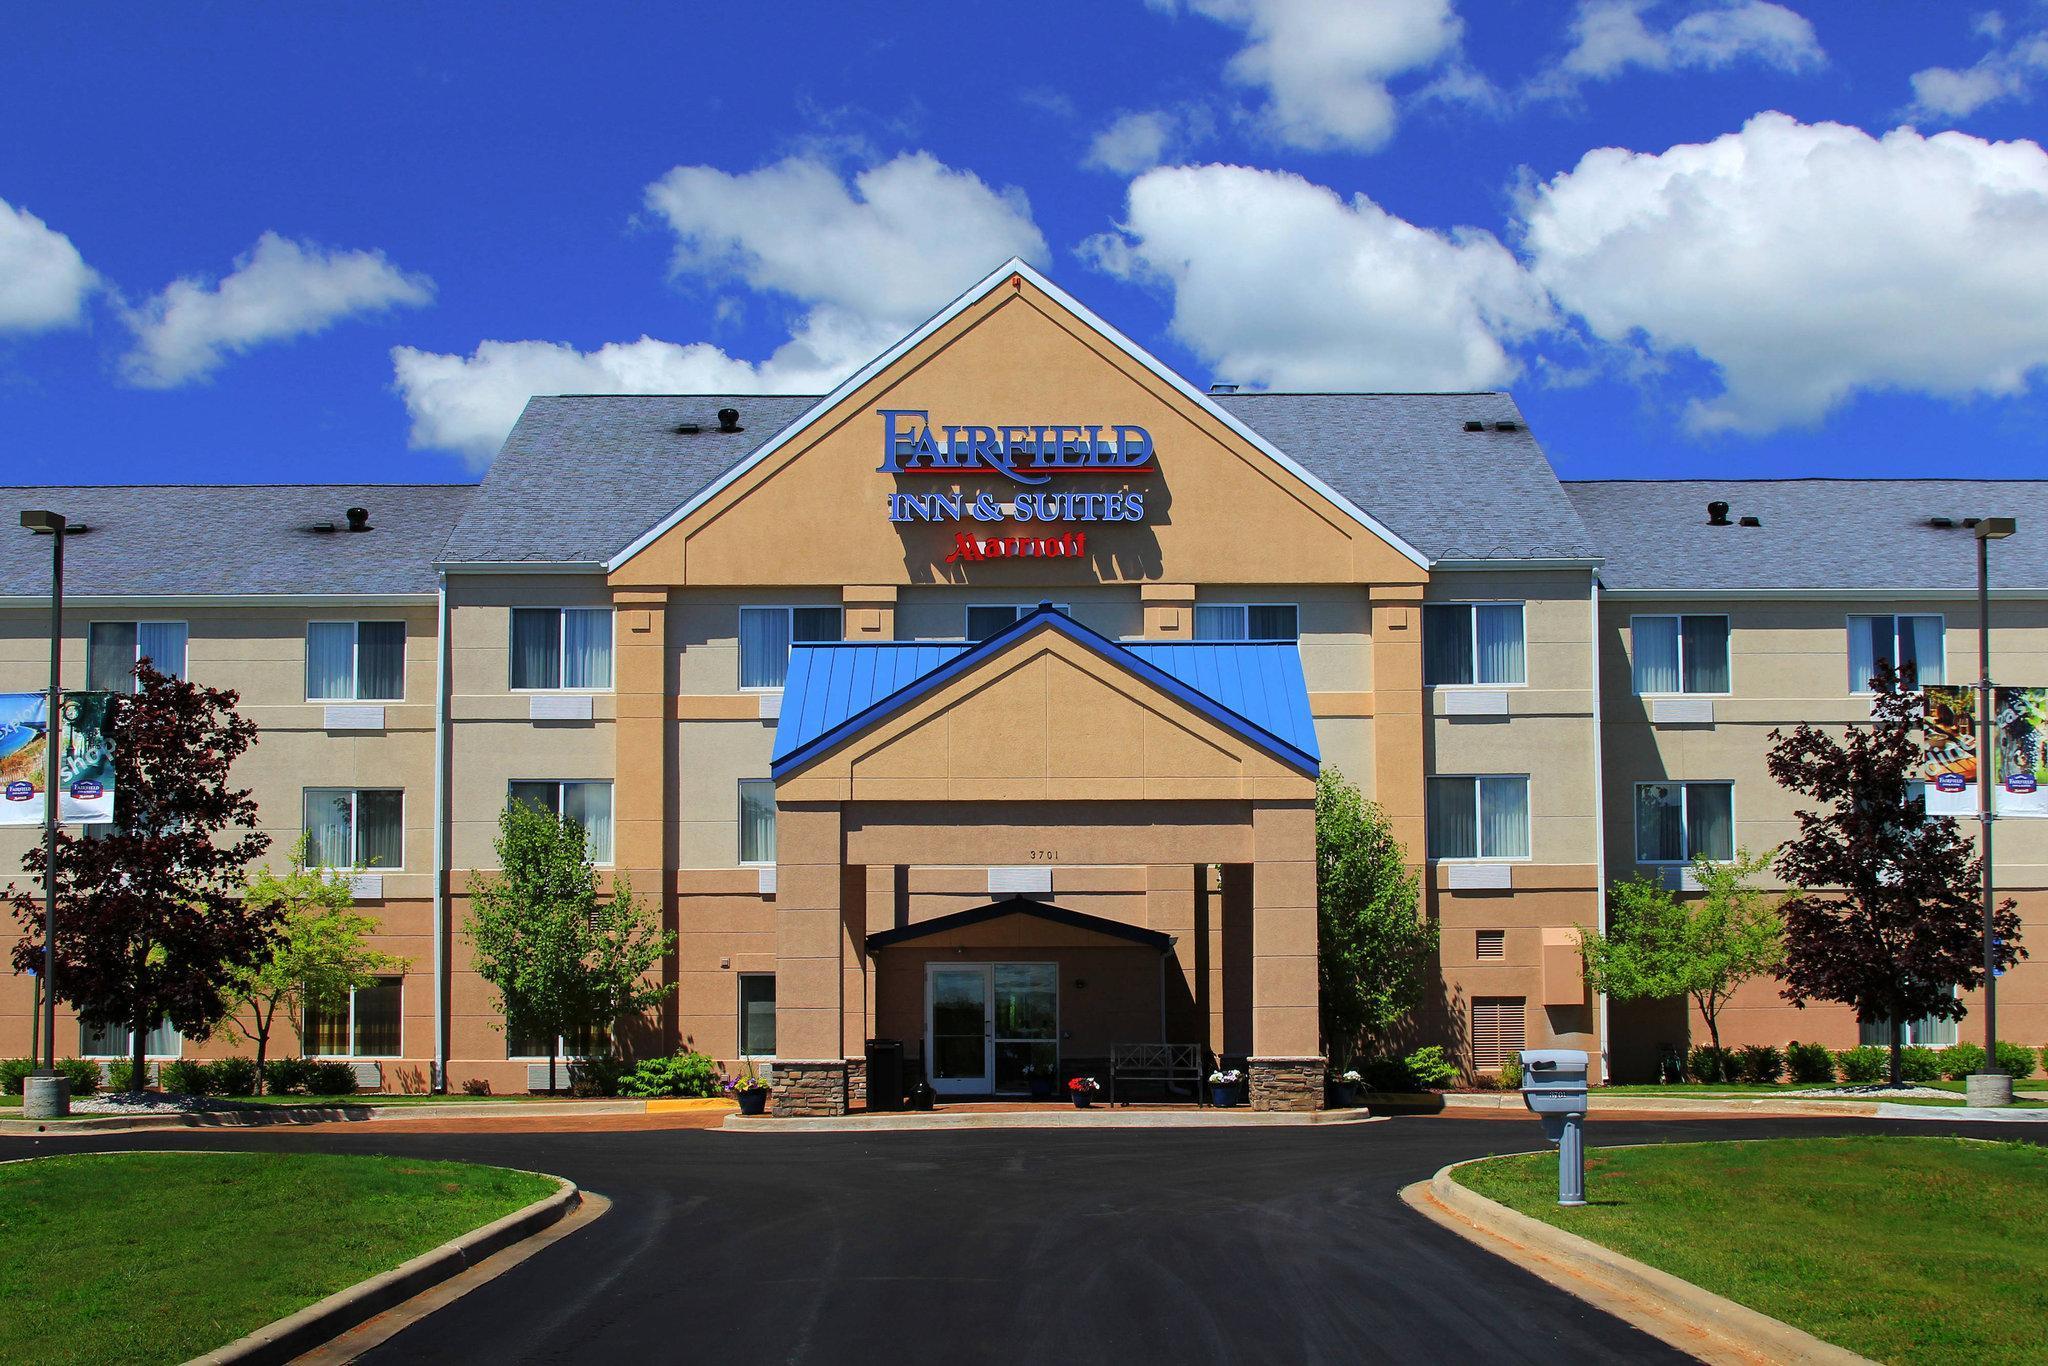 Fairfield Inn & Suites Traverse City, Grand Traverse